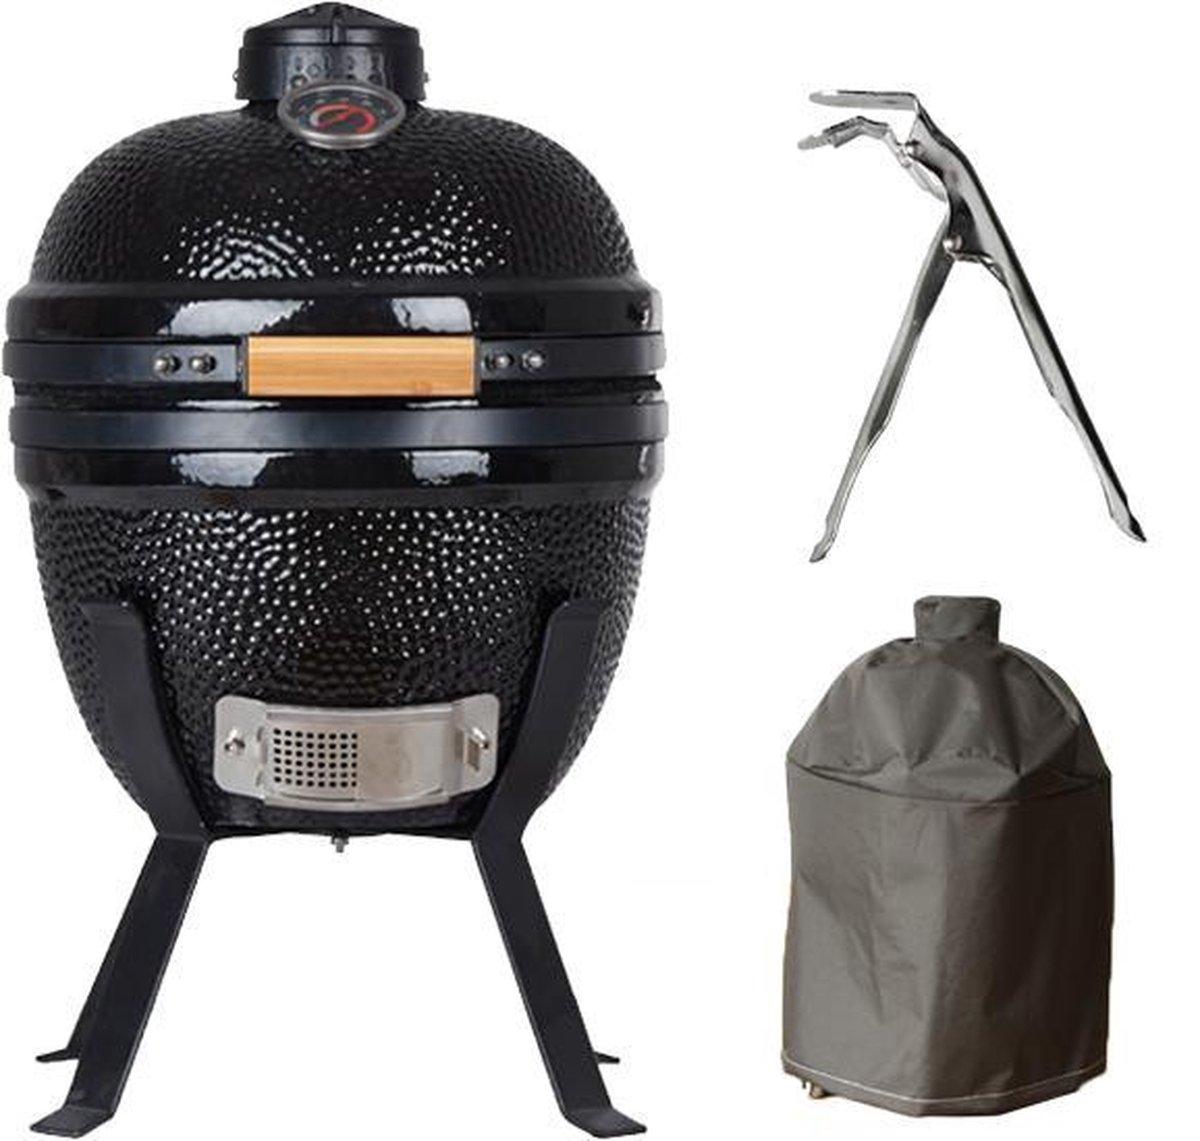 Grill Care Set Comfort 14 inch Kamado BBQ